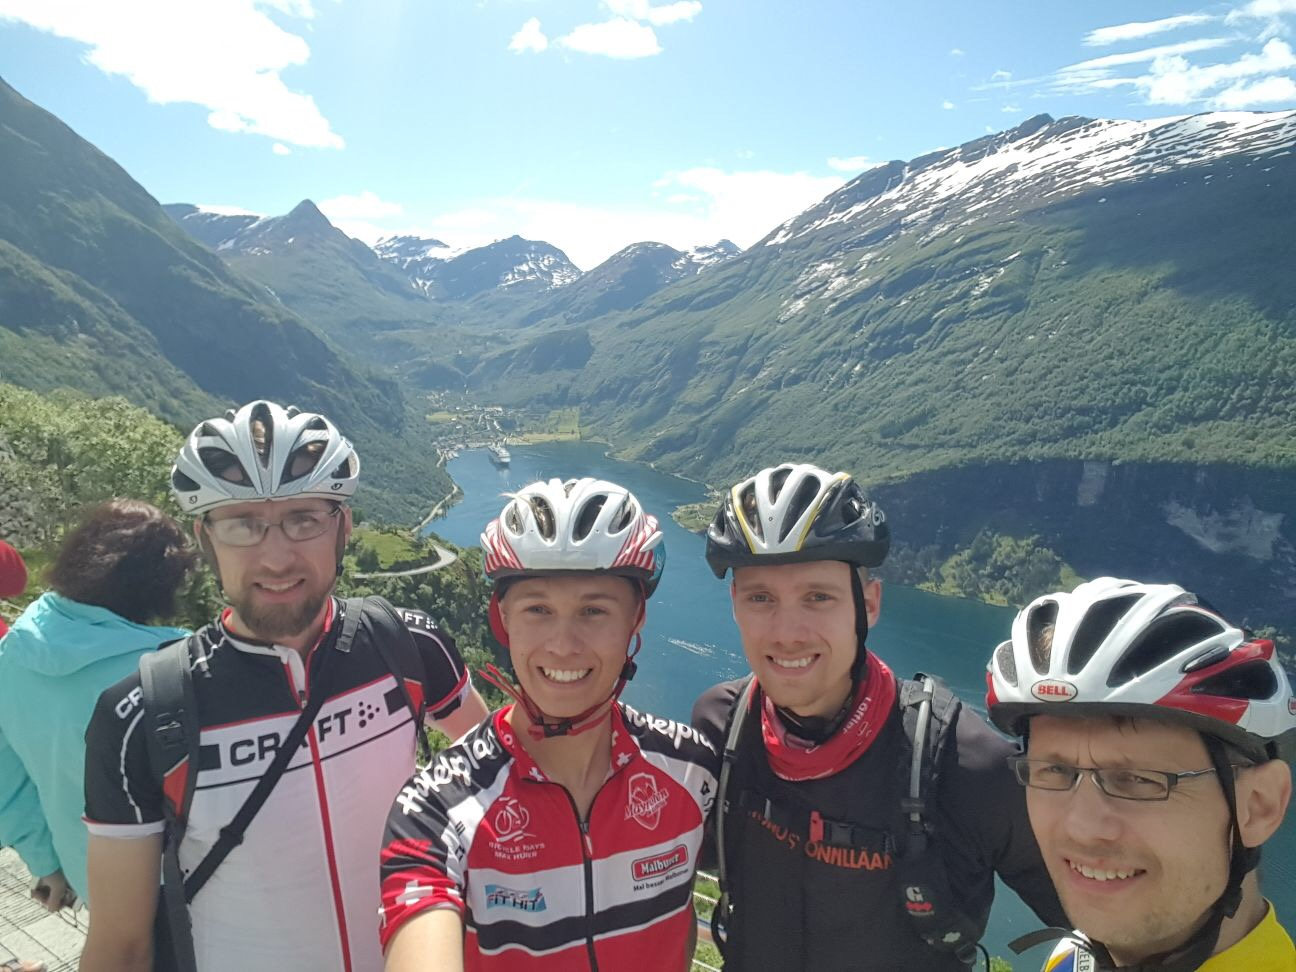 Norja Ahola Sport team